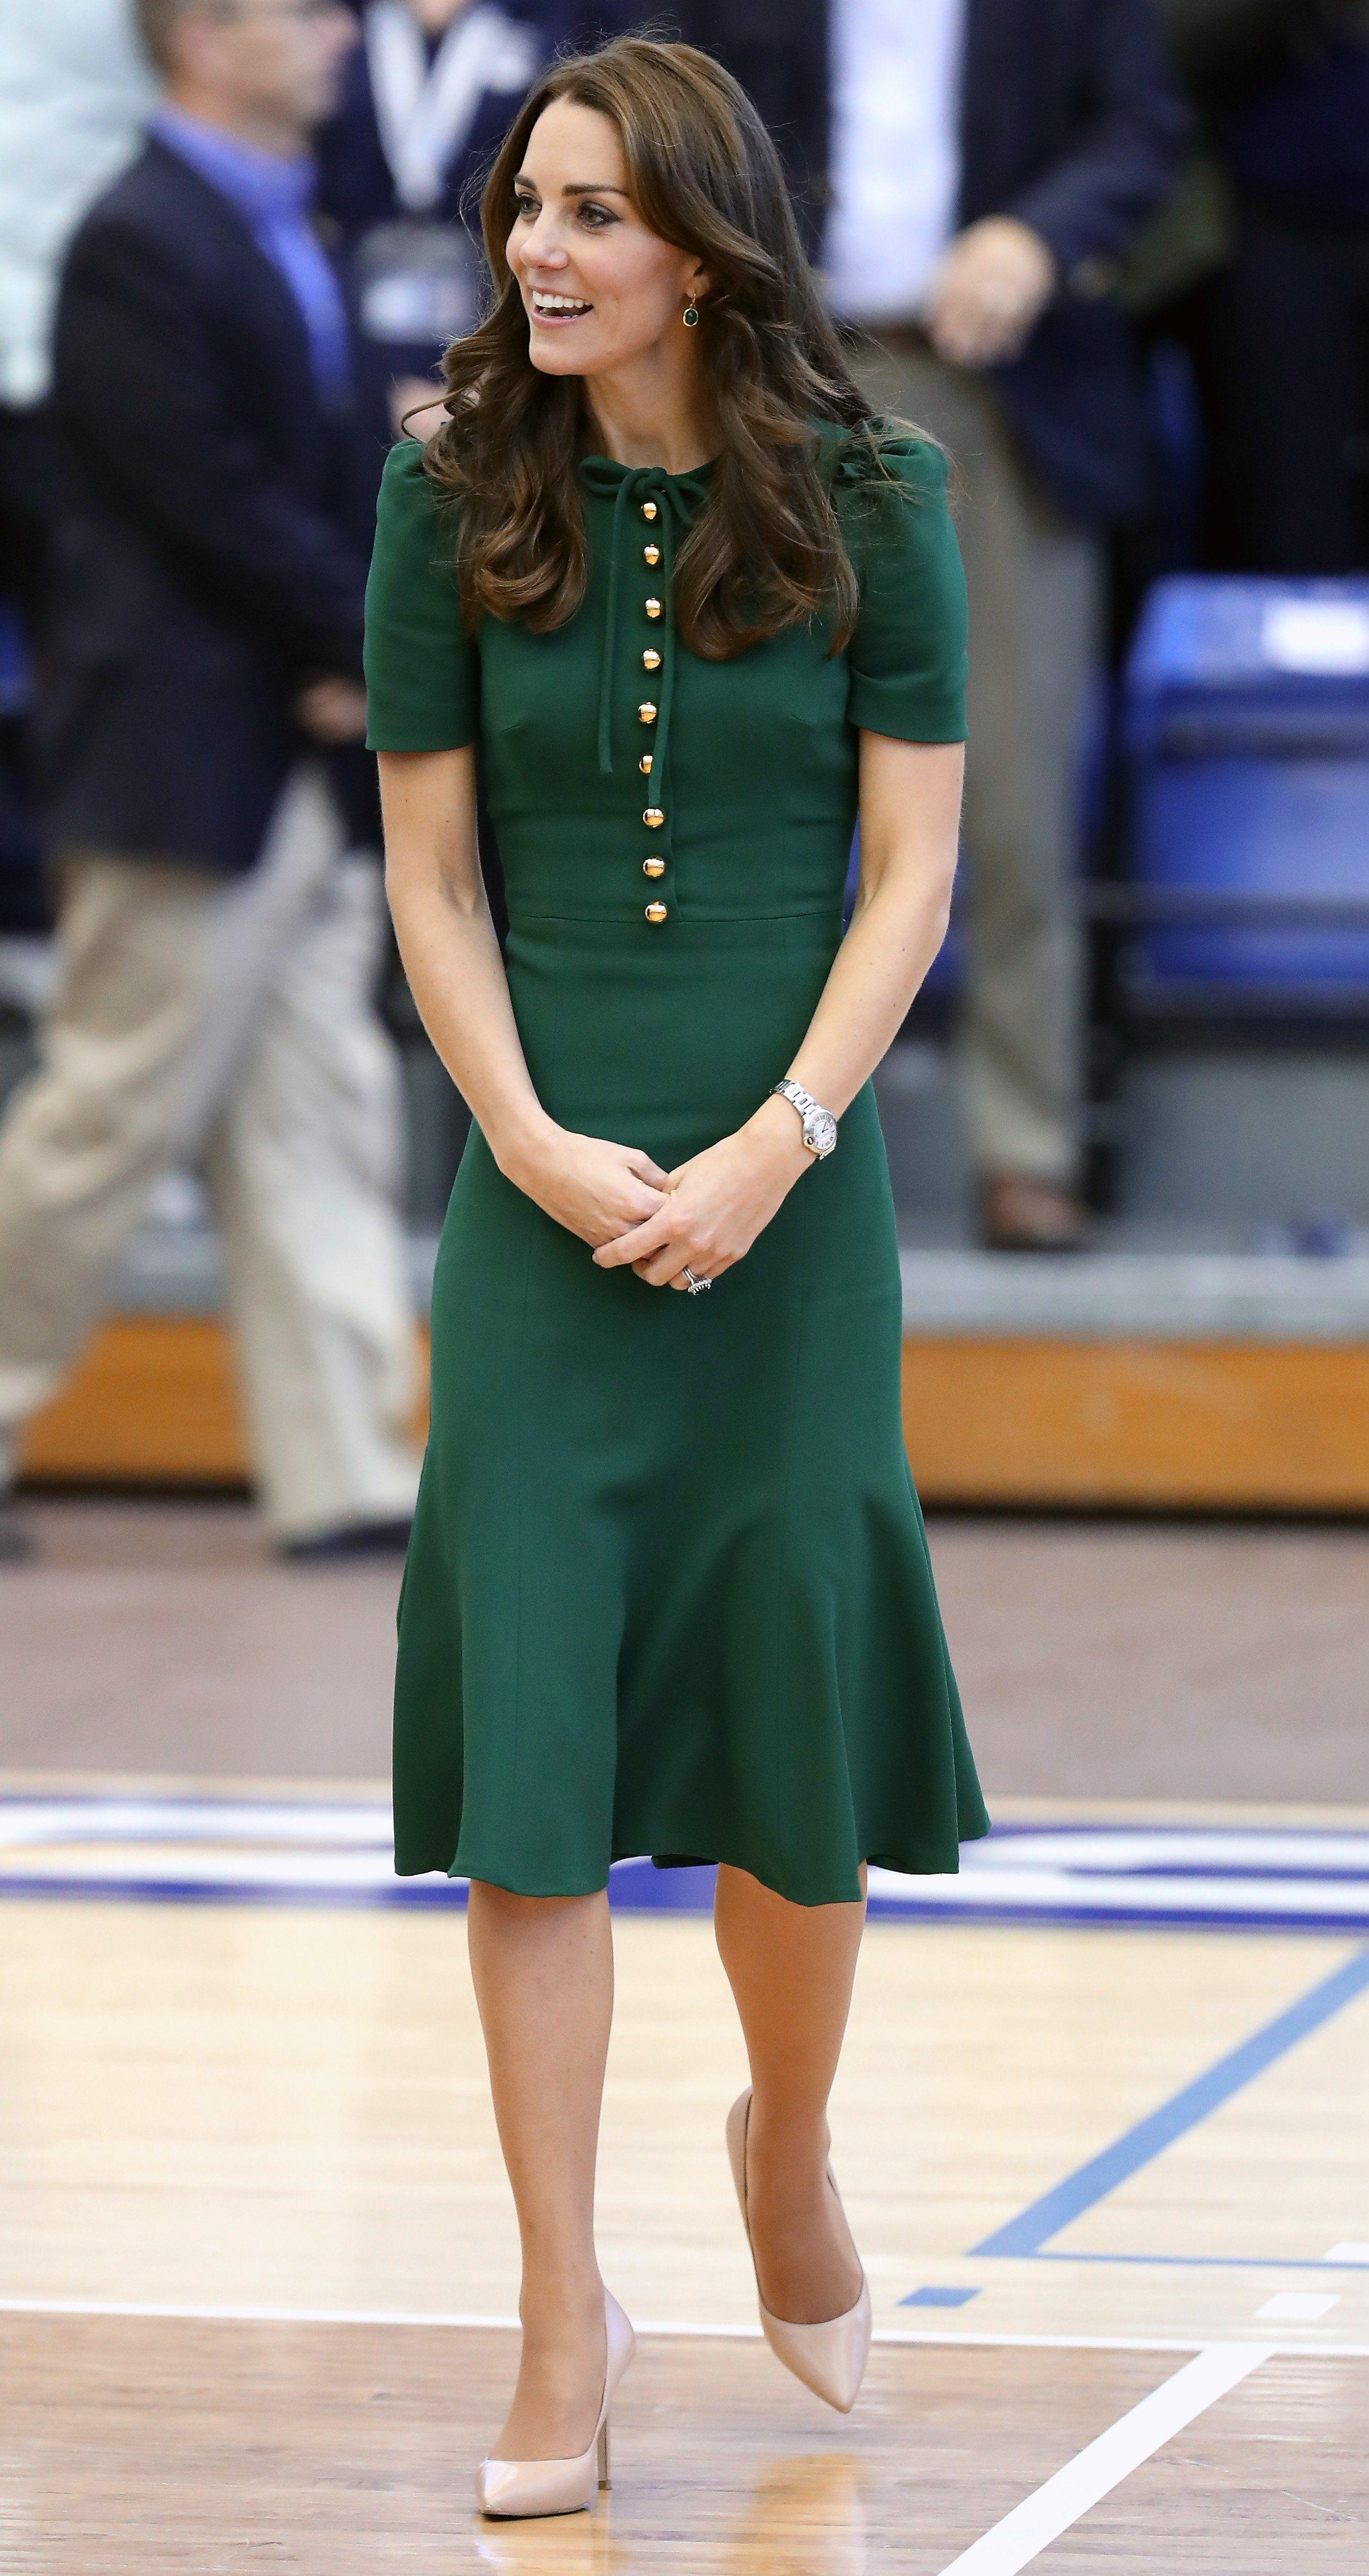 272f441ef The Middleton, o Dolce & Gabbana feito especialmente para Kate ...